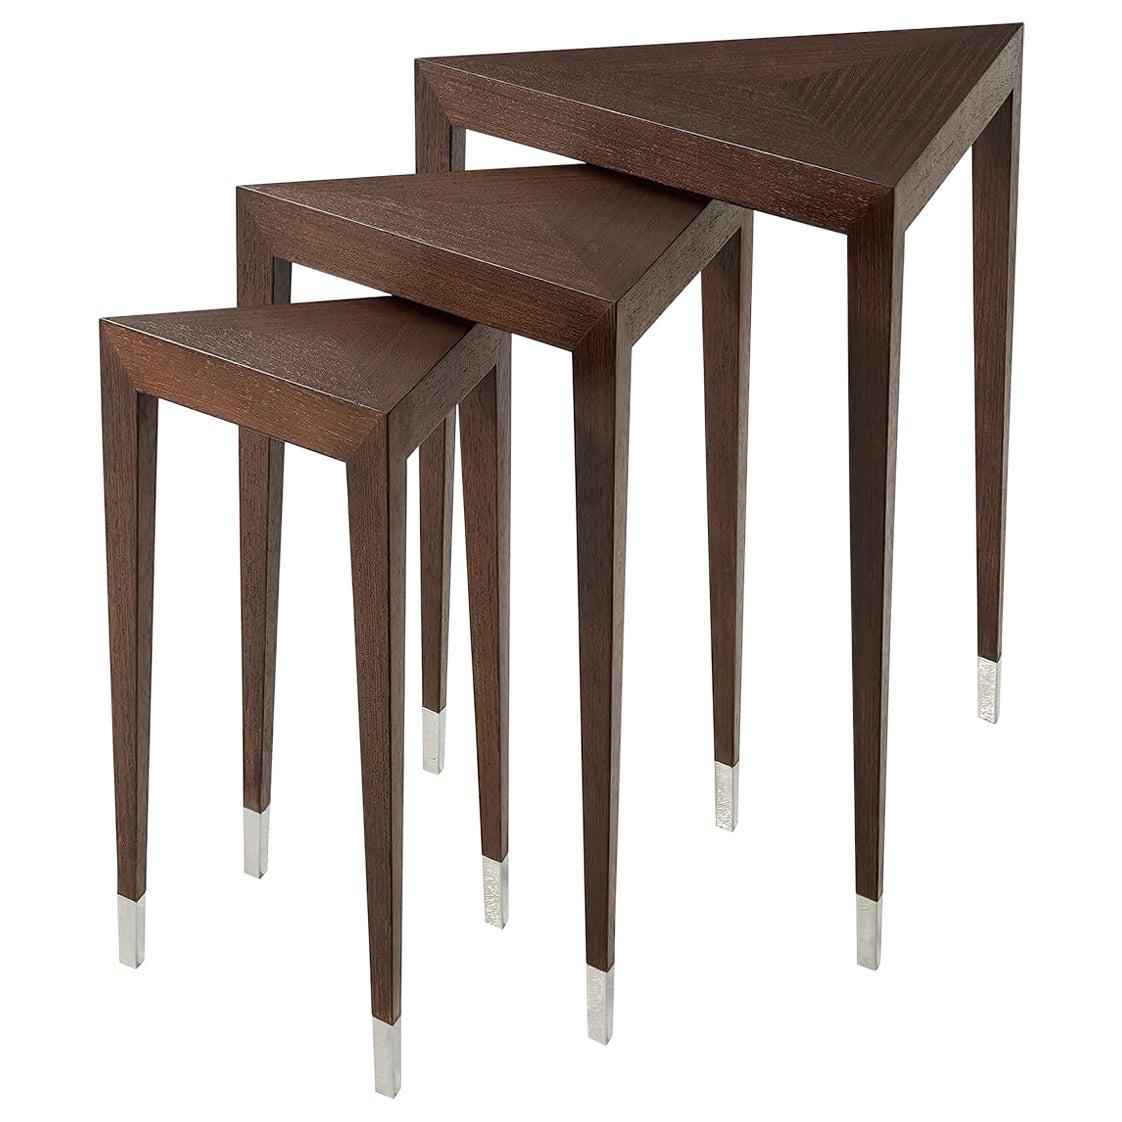 Italian Art Deco Nest of Tables